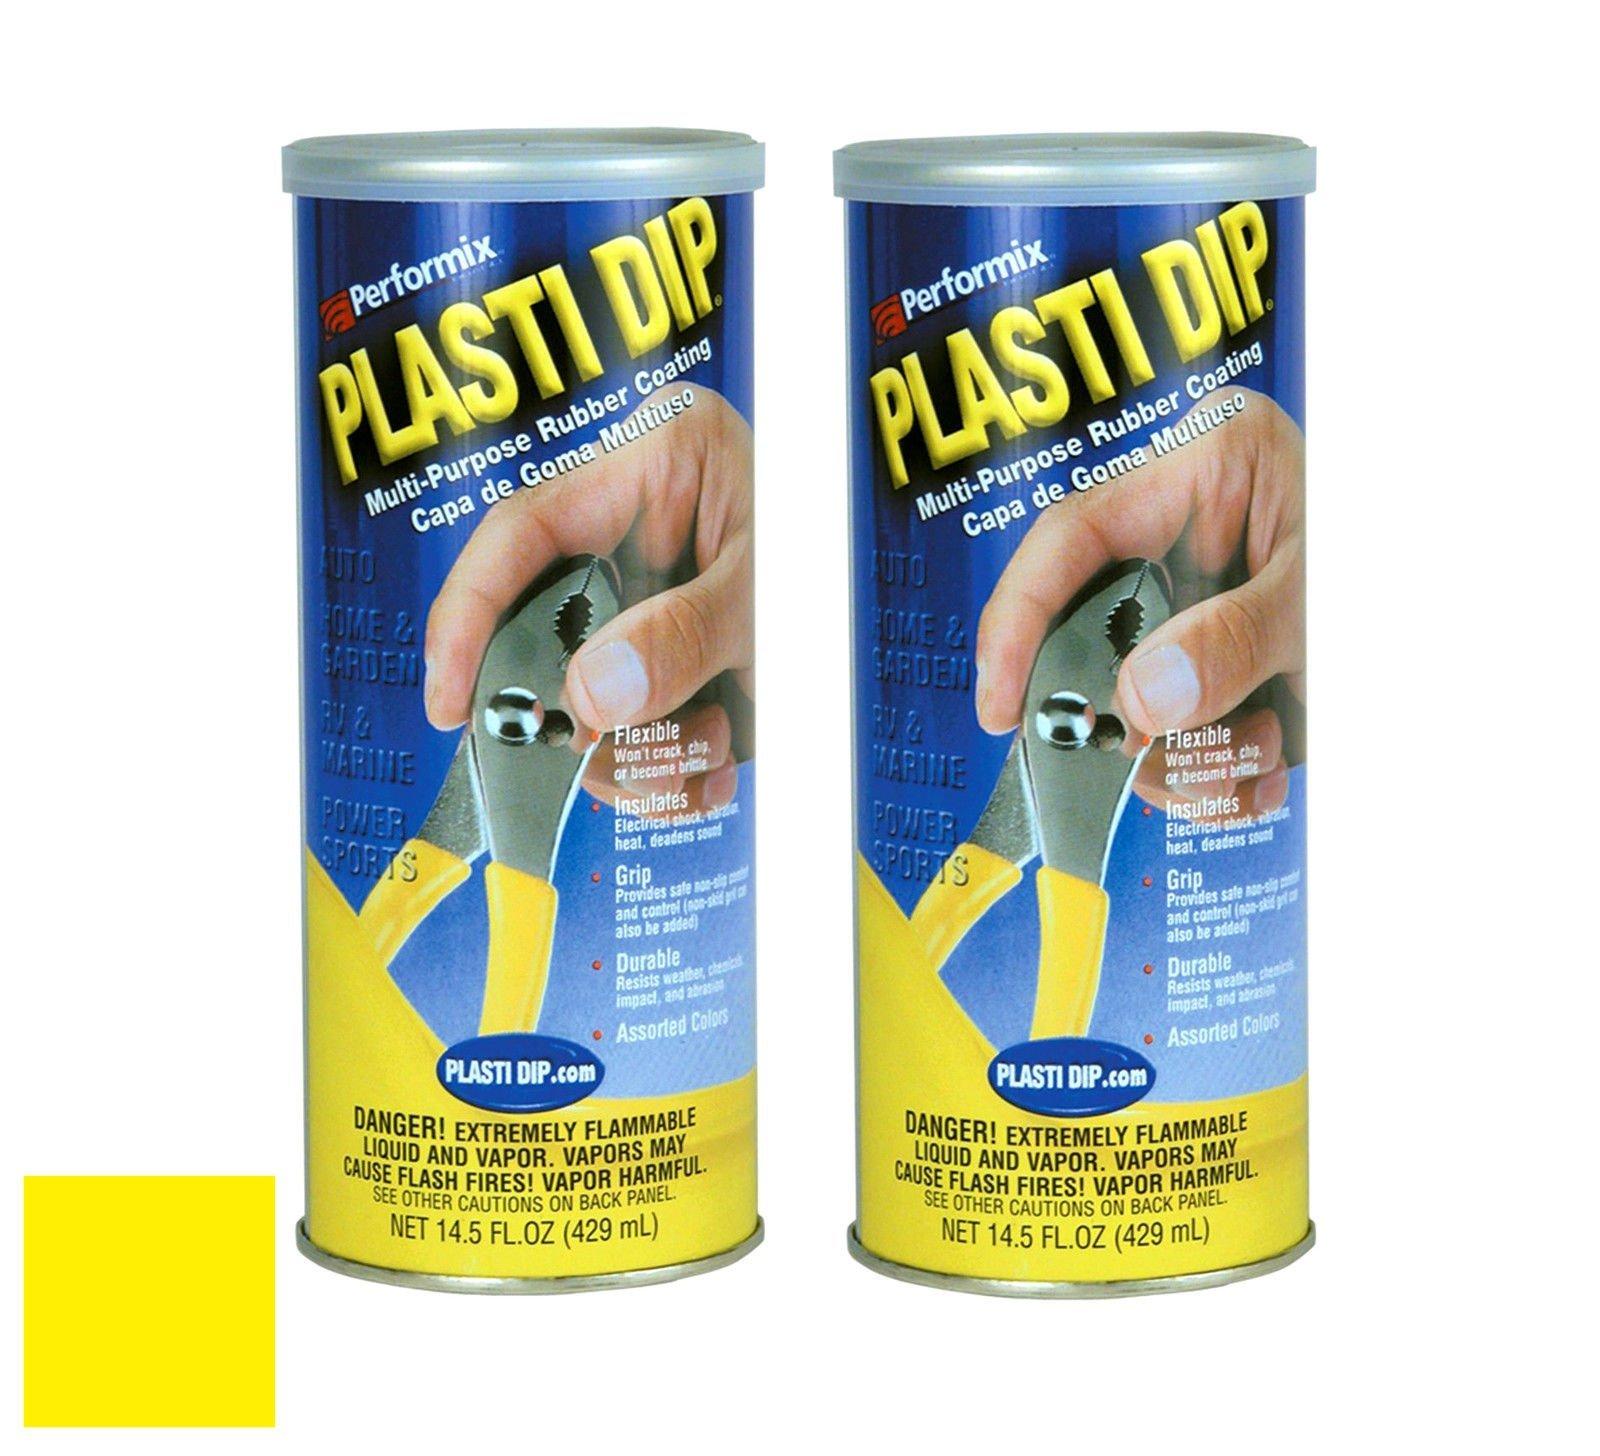 Plasti Dip (11602-6) Multi-Purpose Yellow Synthetic Rubber Coating 14.5oz (2 Pack)